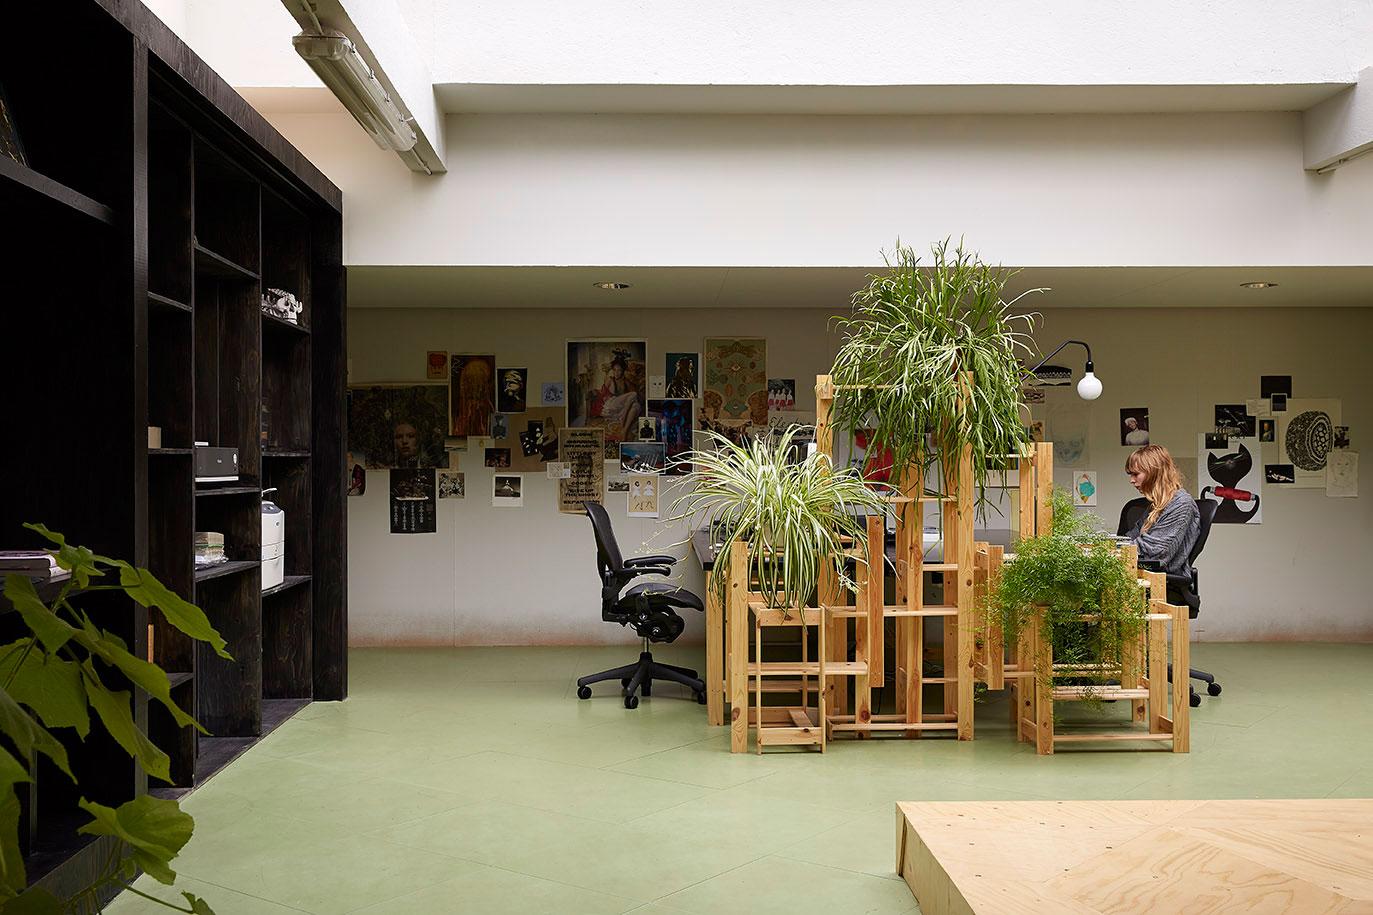 Random studio amsterdam office designed by x l yellowtrace for Office design studio